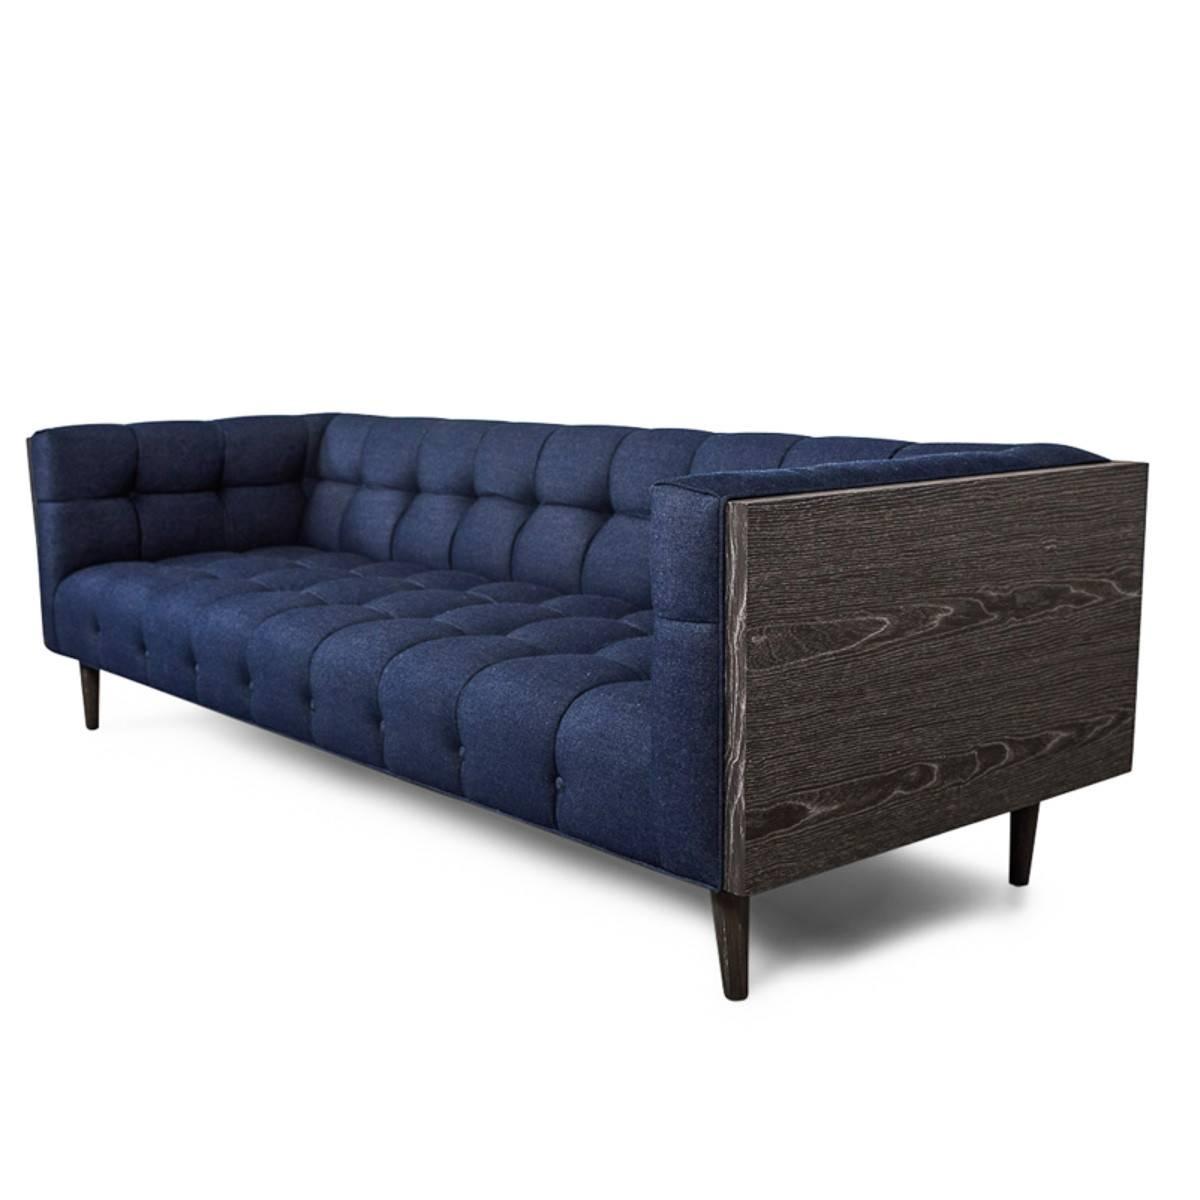 Sofas: Mid Century Settee | Mid Century Sofas | Cheap Mid Century In Cheap Retro Sofas (View 15 of 30)